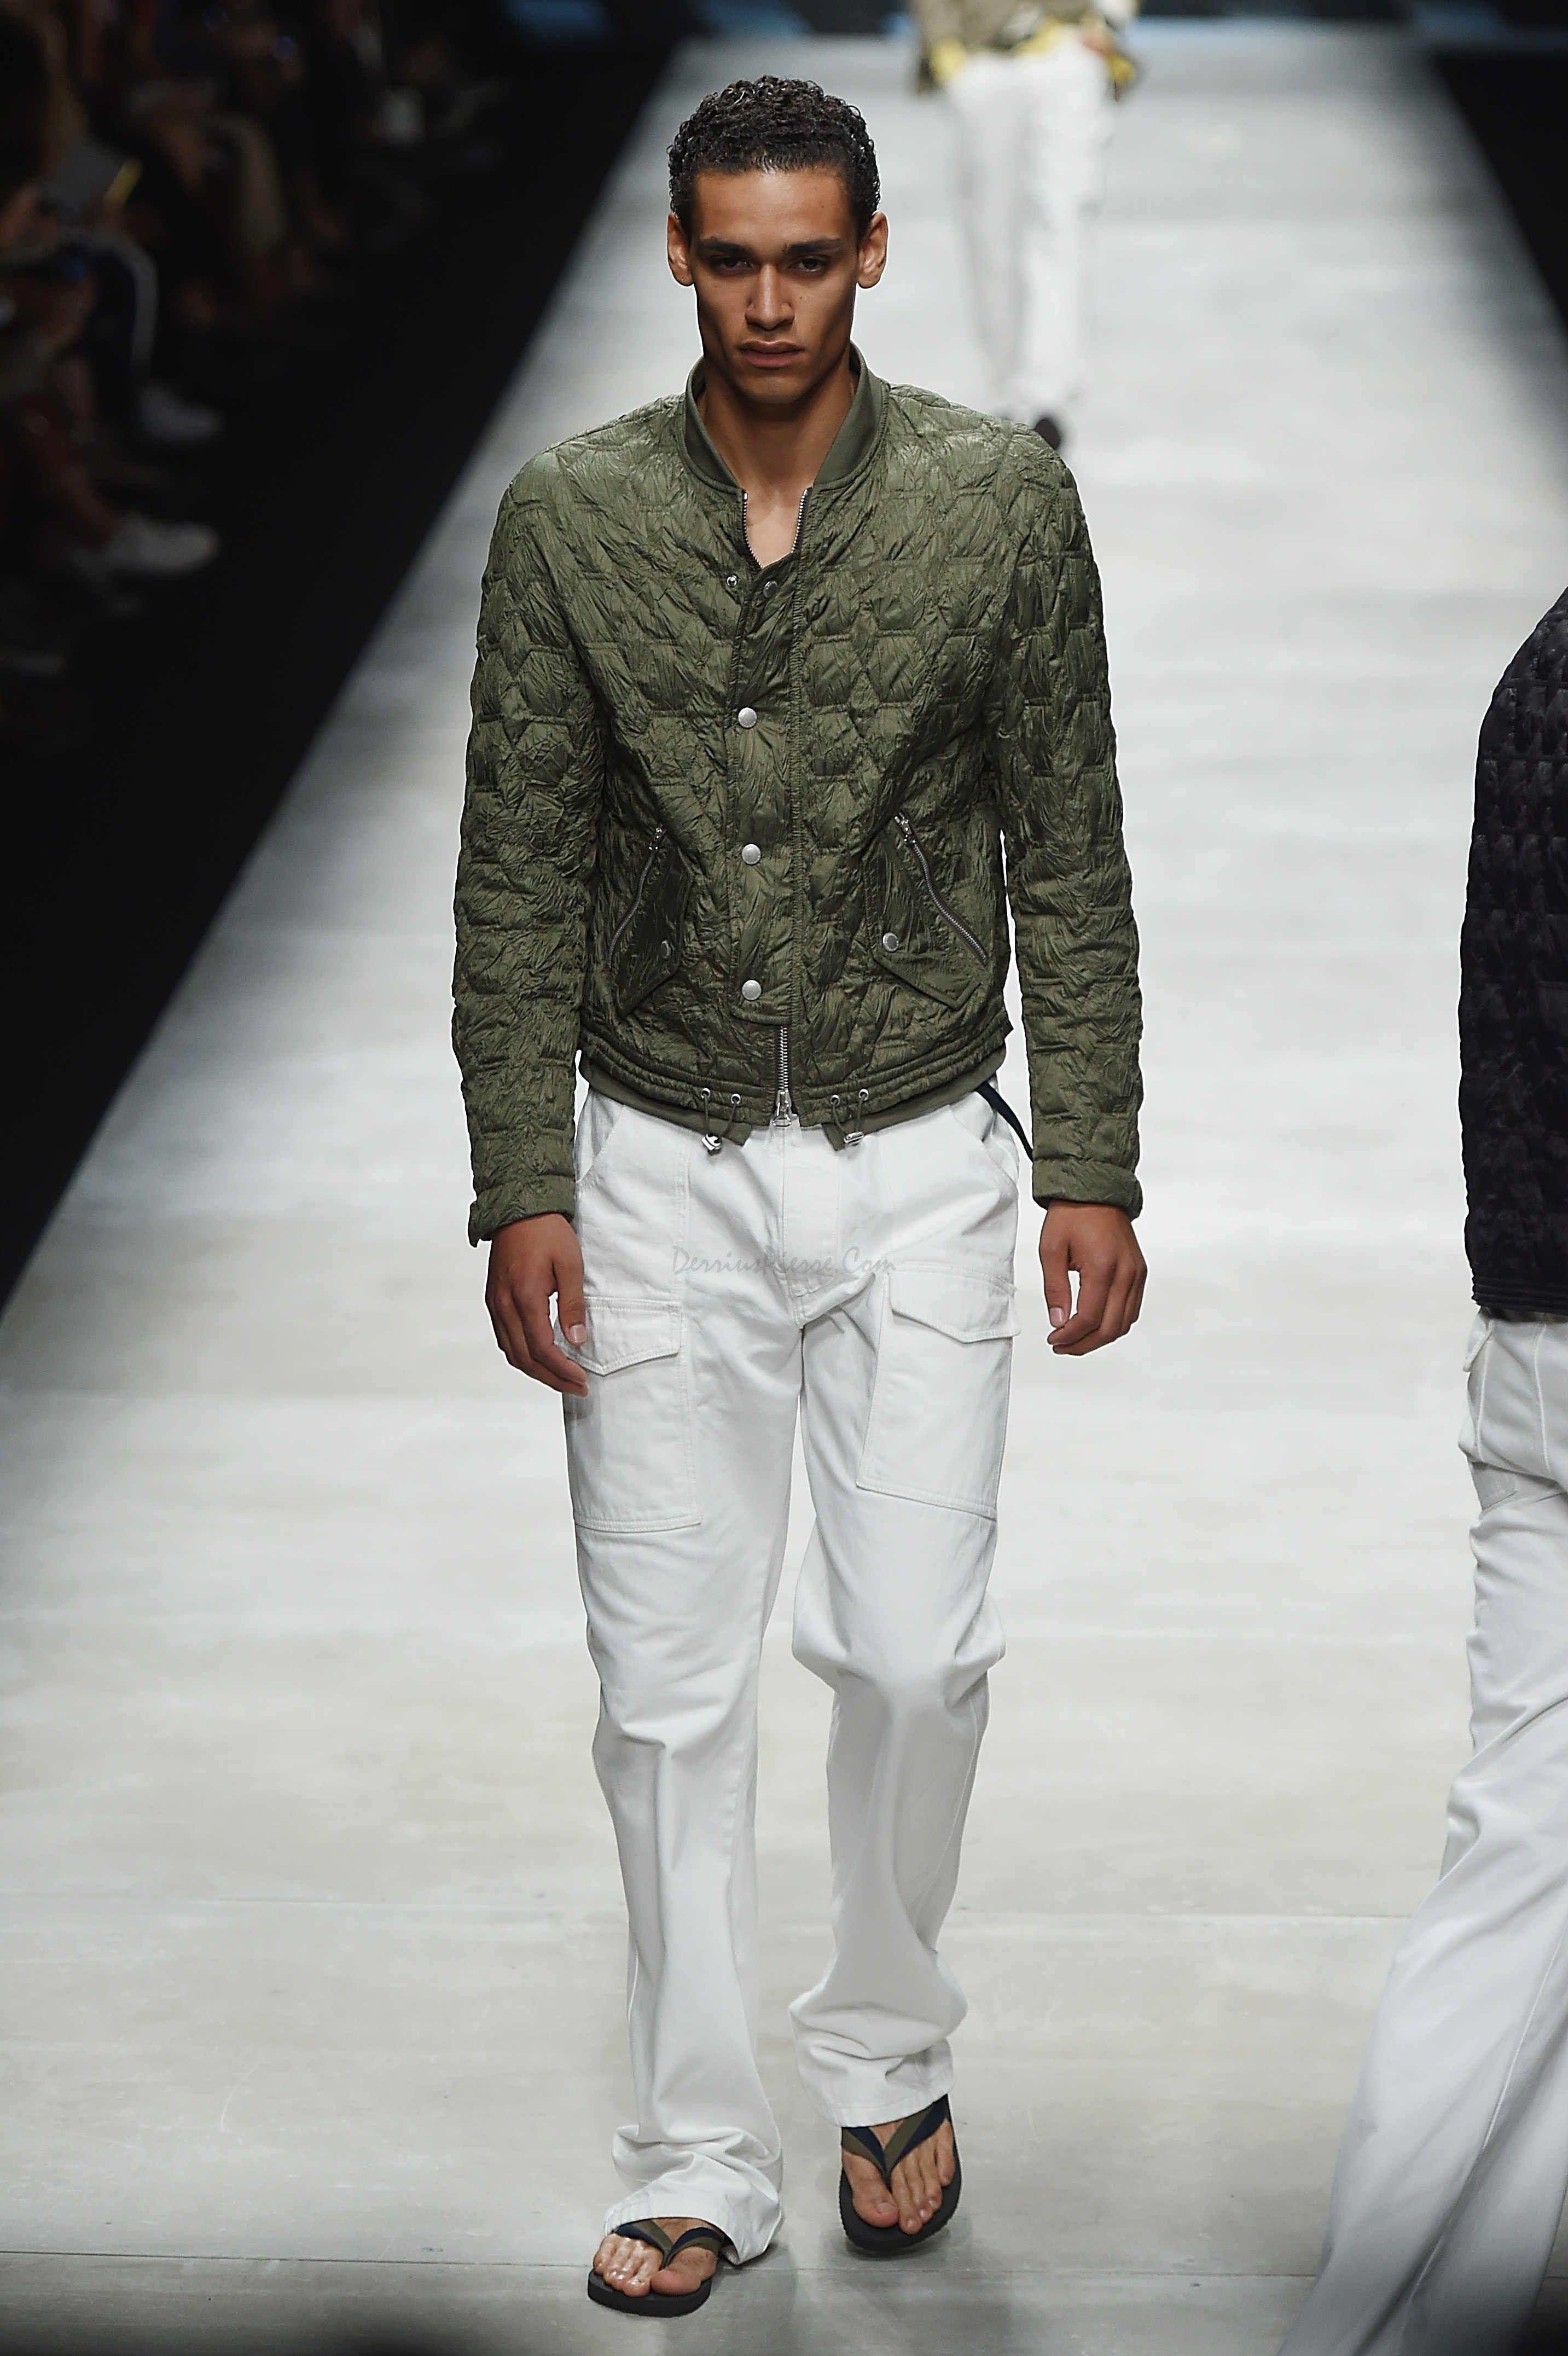 Ermanno Scervino Spring Summer 2016 Collection Primavera Verano #Menswear #Trends #Tendencias #Moda Hombre  Milan Fashion Week - D.P.